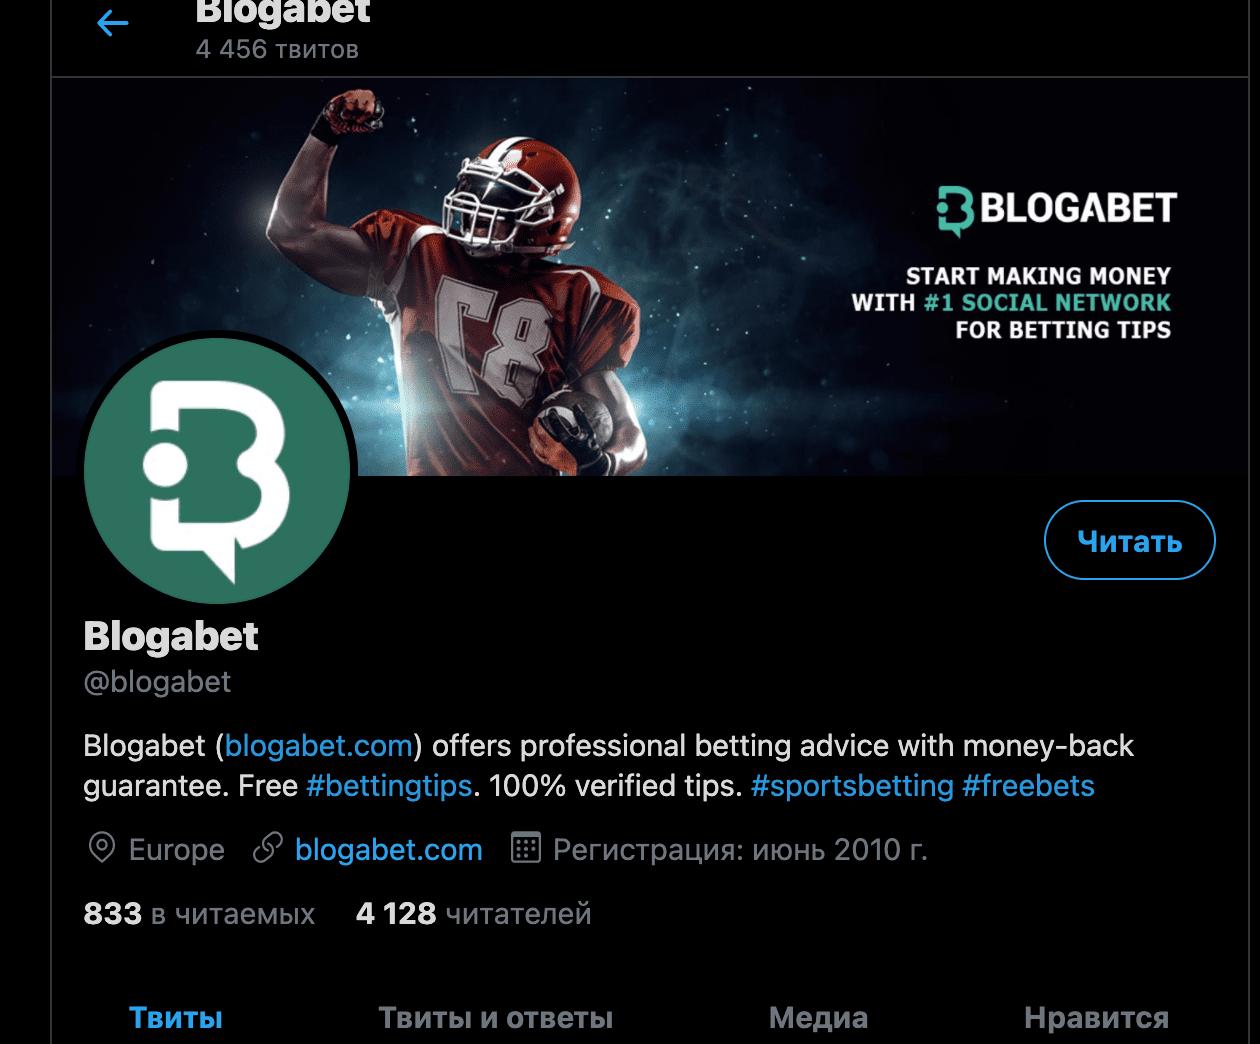 Твиттер аккаунт проекта Блогабет.ком(Blogabet)